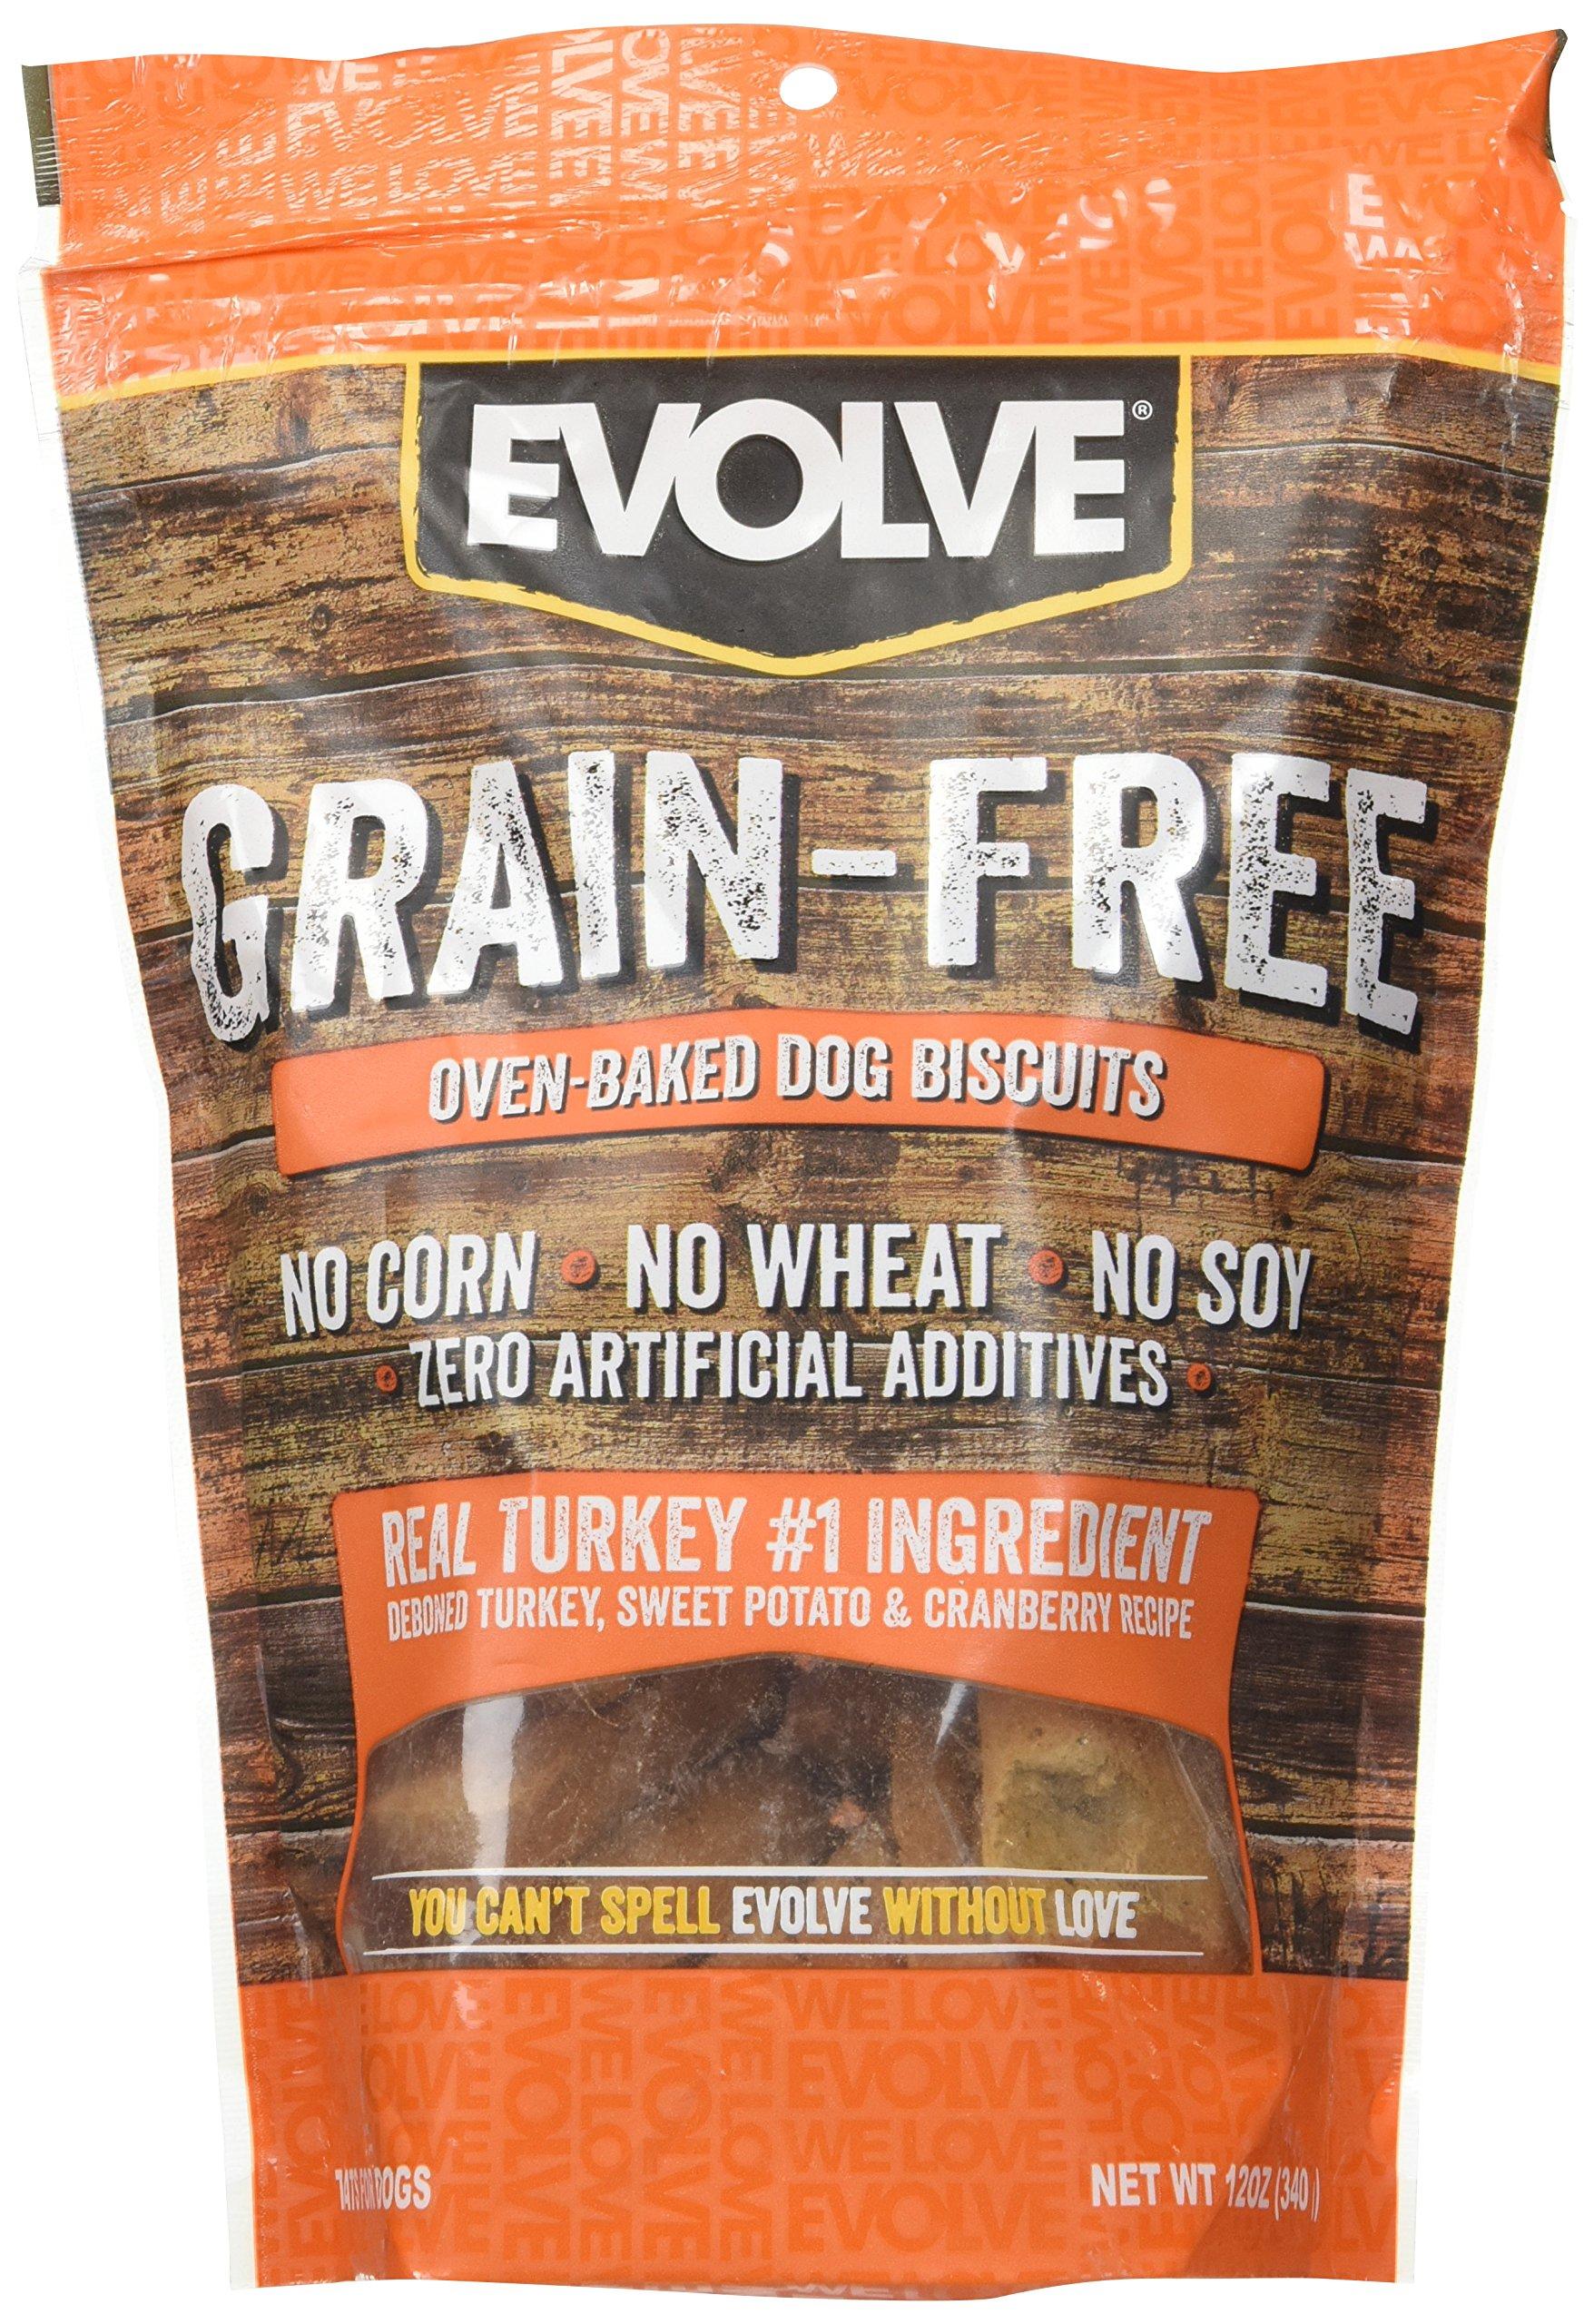 Evolve Oven Baked Grain Free Deboned Turkey Biscuits, 12oz